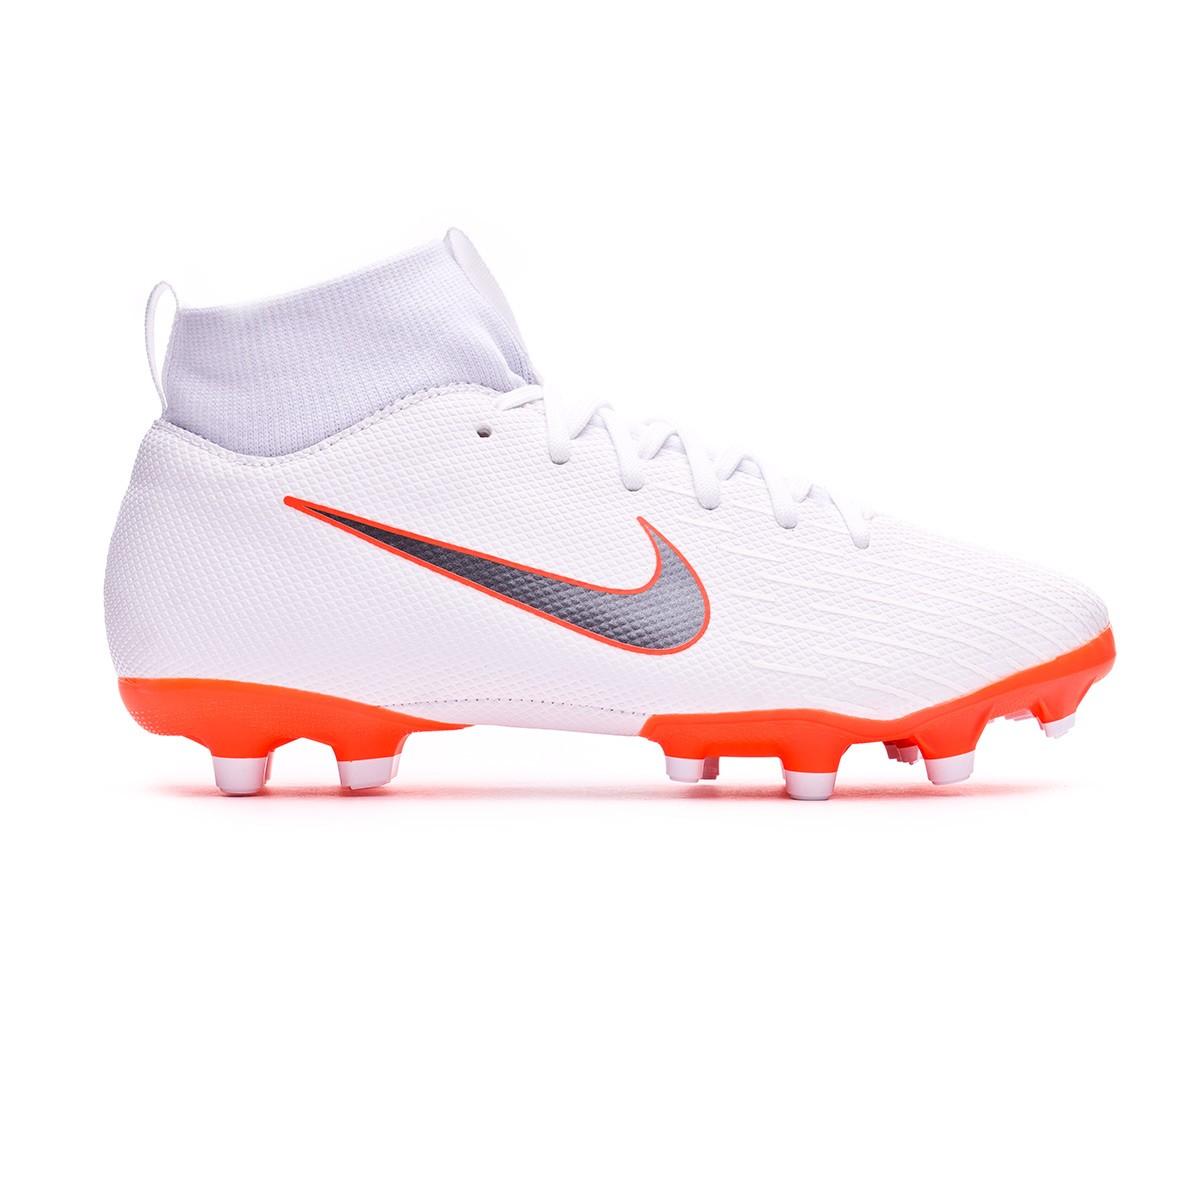 e7621b5af Football Boots Nike Kids Mercurial Superfly VI Academy GS MG White-Metallic  cool grey-Total orange - Tienda de fútbol Fútbol Emotion